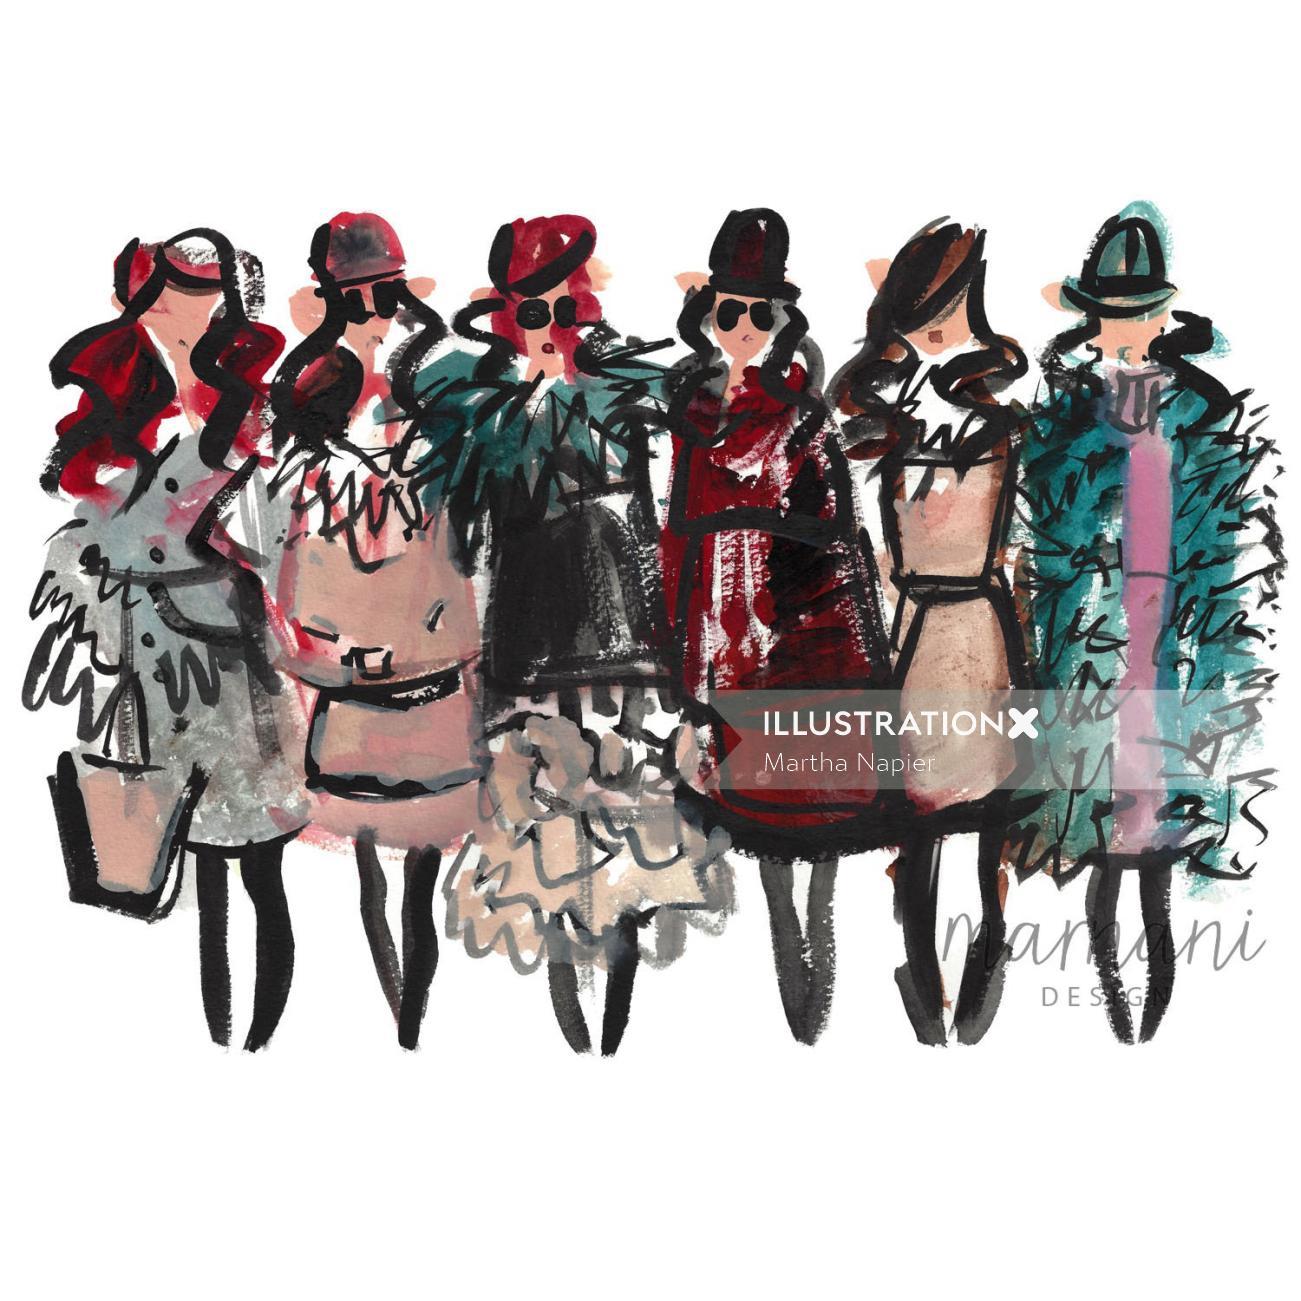 Fashion, Whimsical, Gestural, Figures, Fashion Forward, Runway, Blogger, Editors